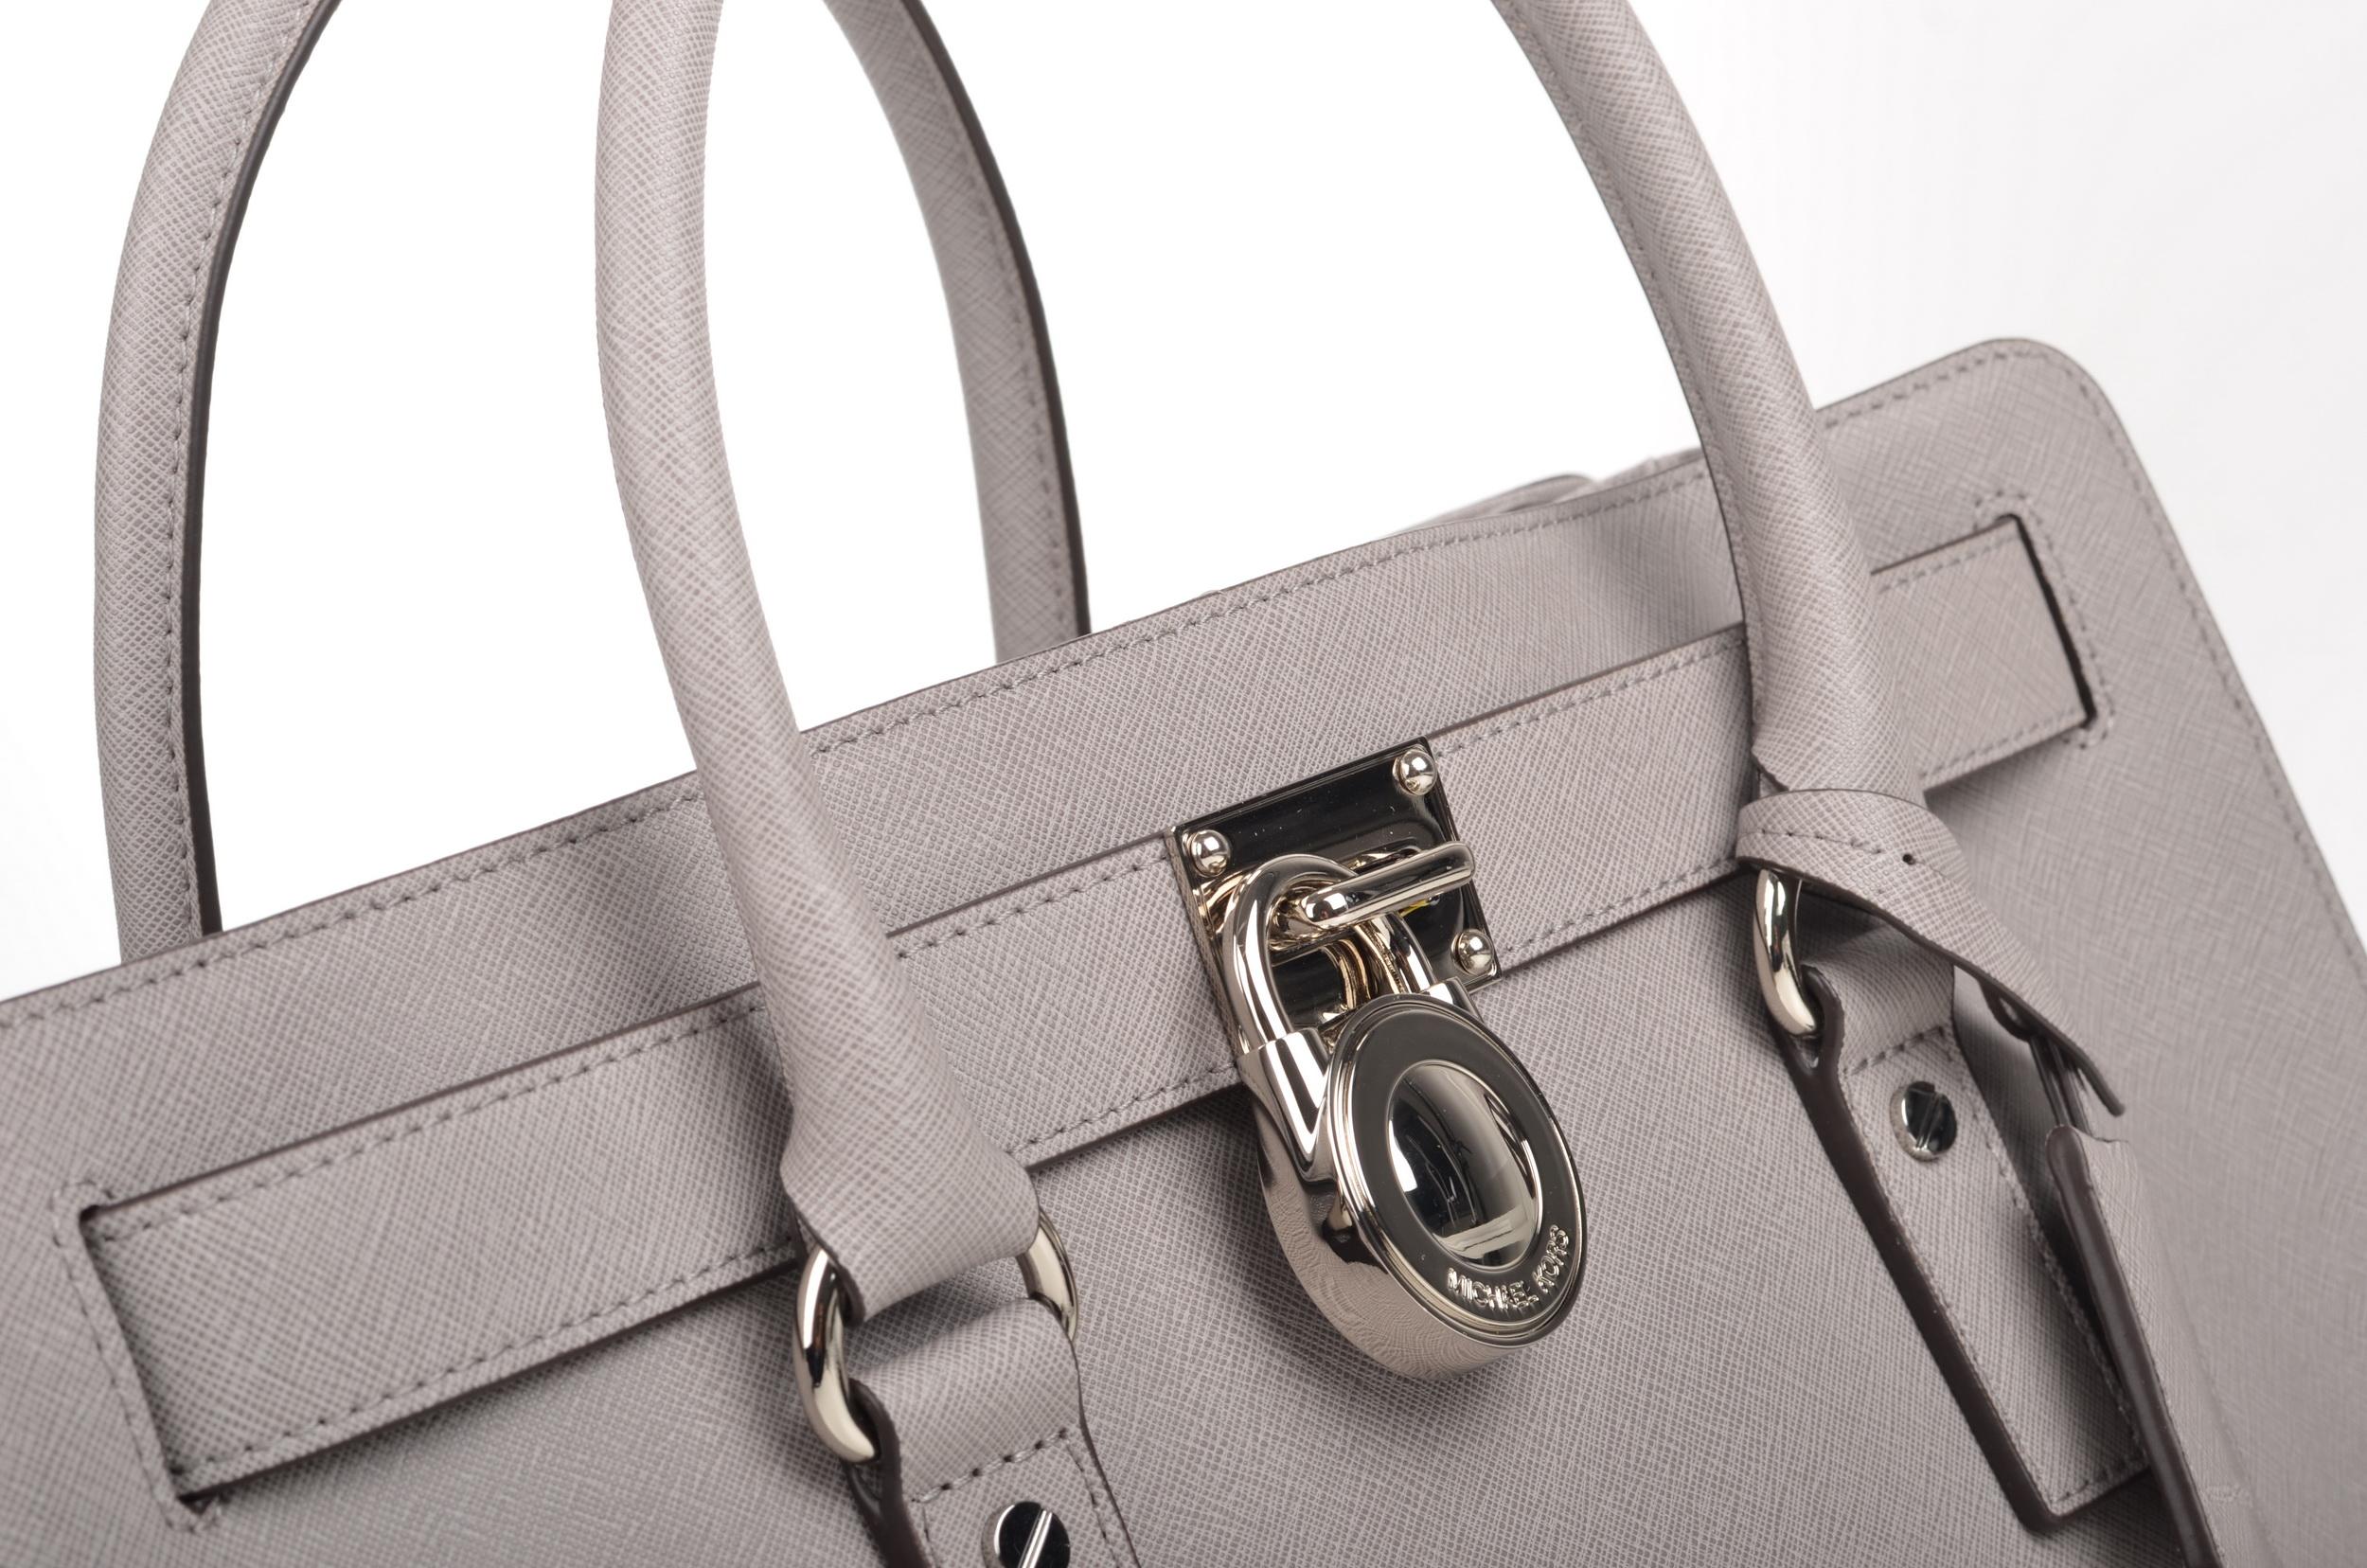 file michael kors hamilton lg ew satchel handtasche 30f4shms7t kalbsleder grau silber pearl. Black Bedroom Furniture Sets. Home Design Ideas